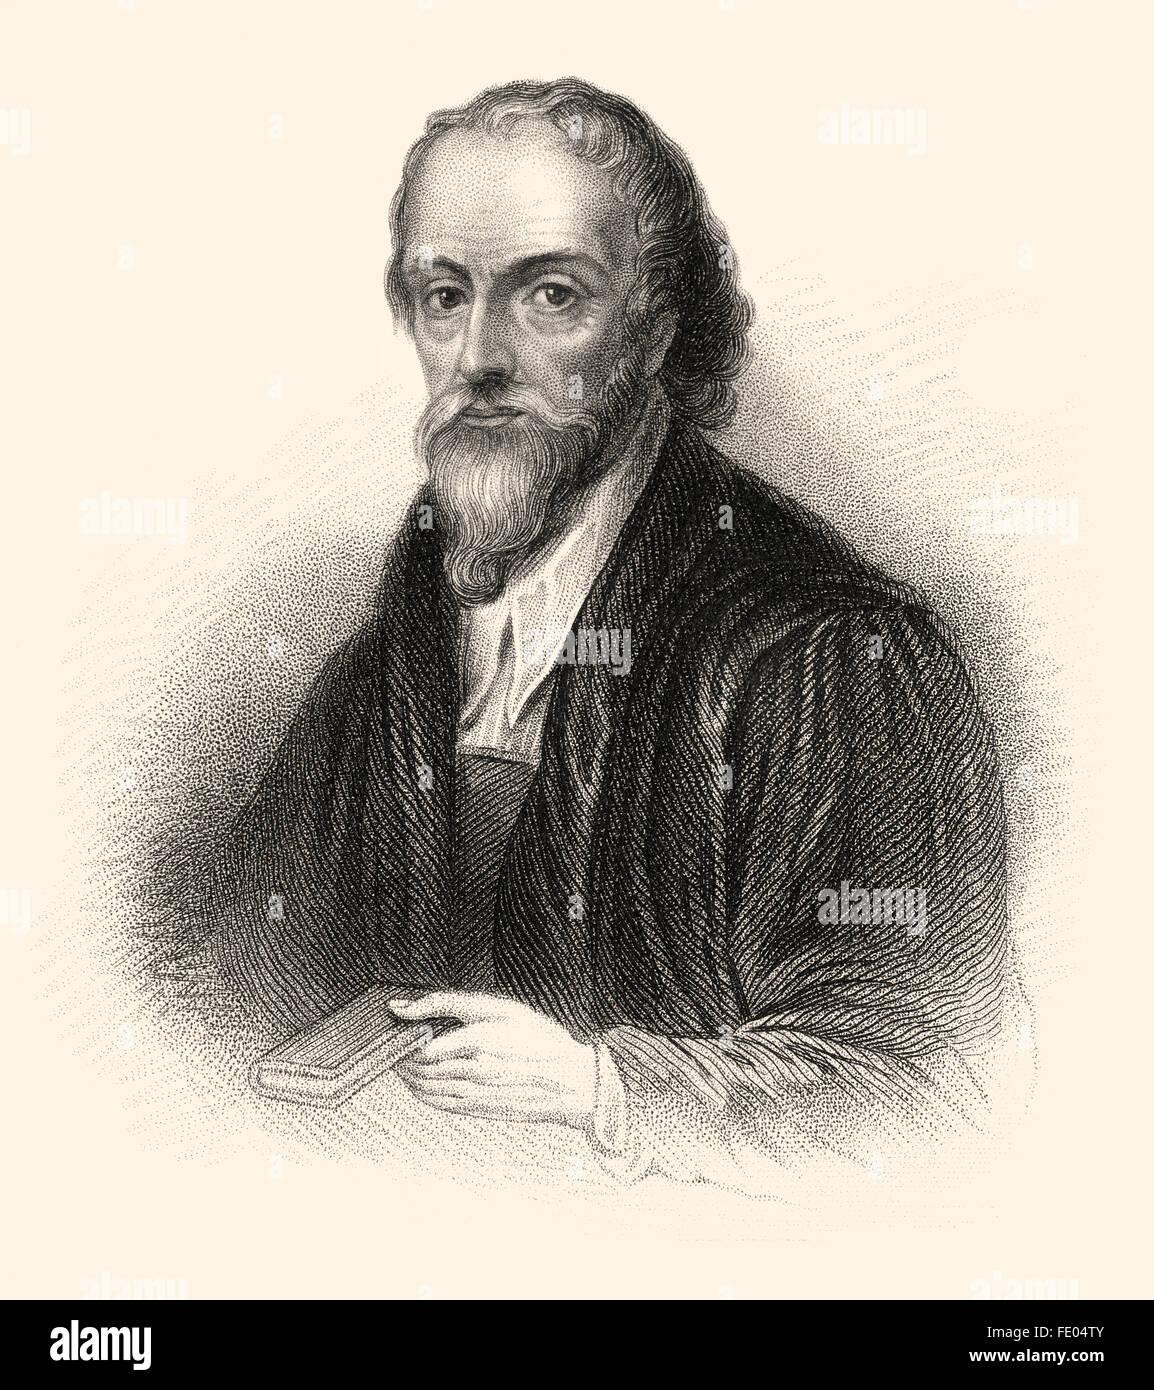 Nicholas Ridley, c.1500-1555, an English Bishop of London - Stock Image